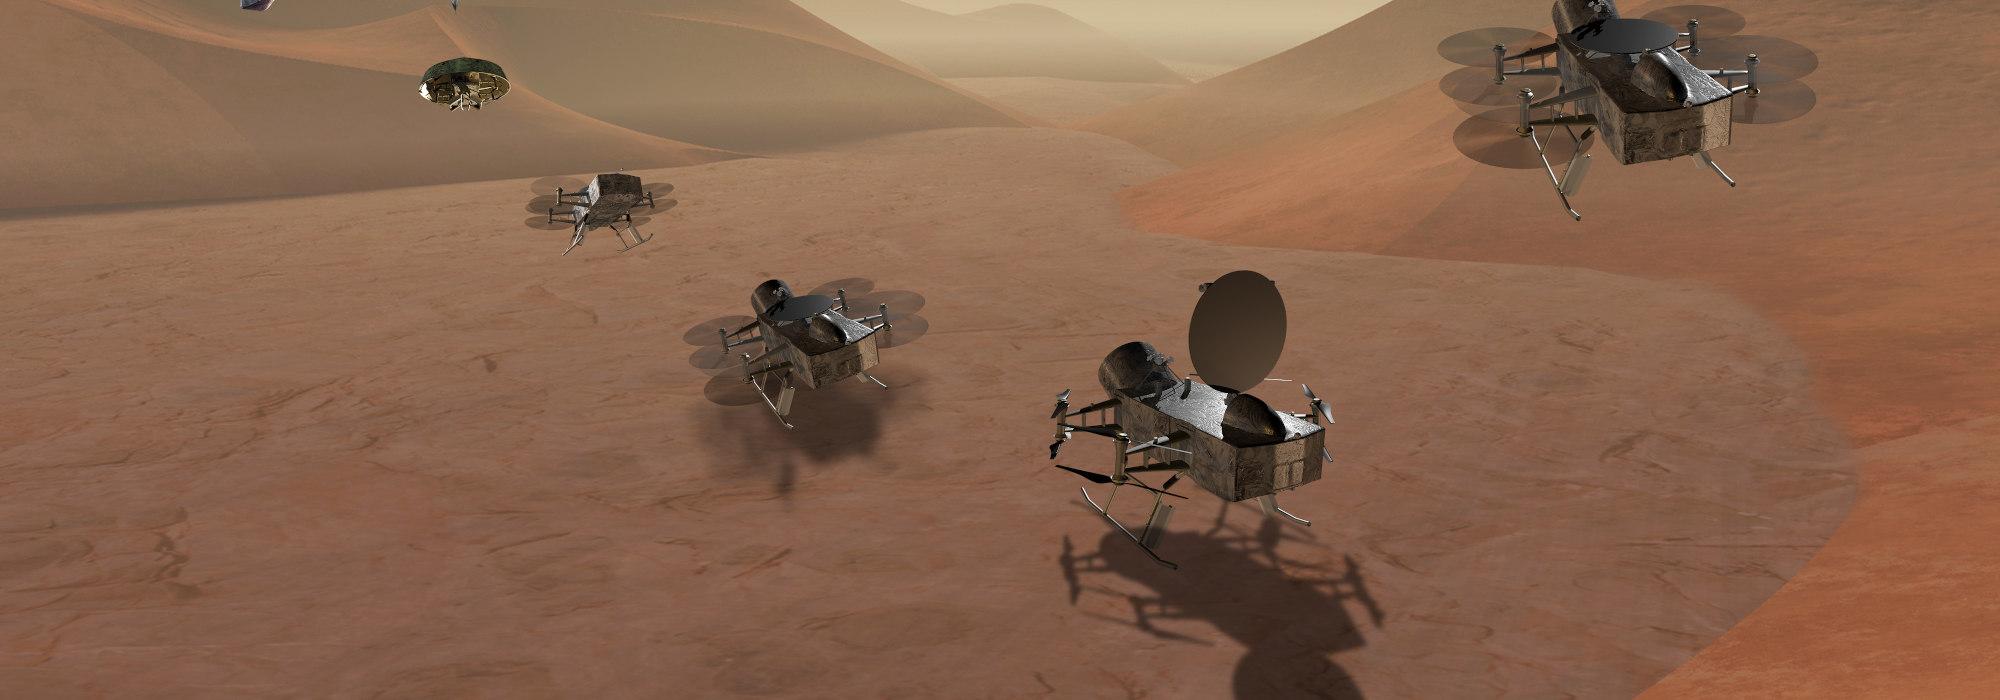 NASA'nın DRAGONFLY Misyonu: Titan'da yaşam arayacak drone